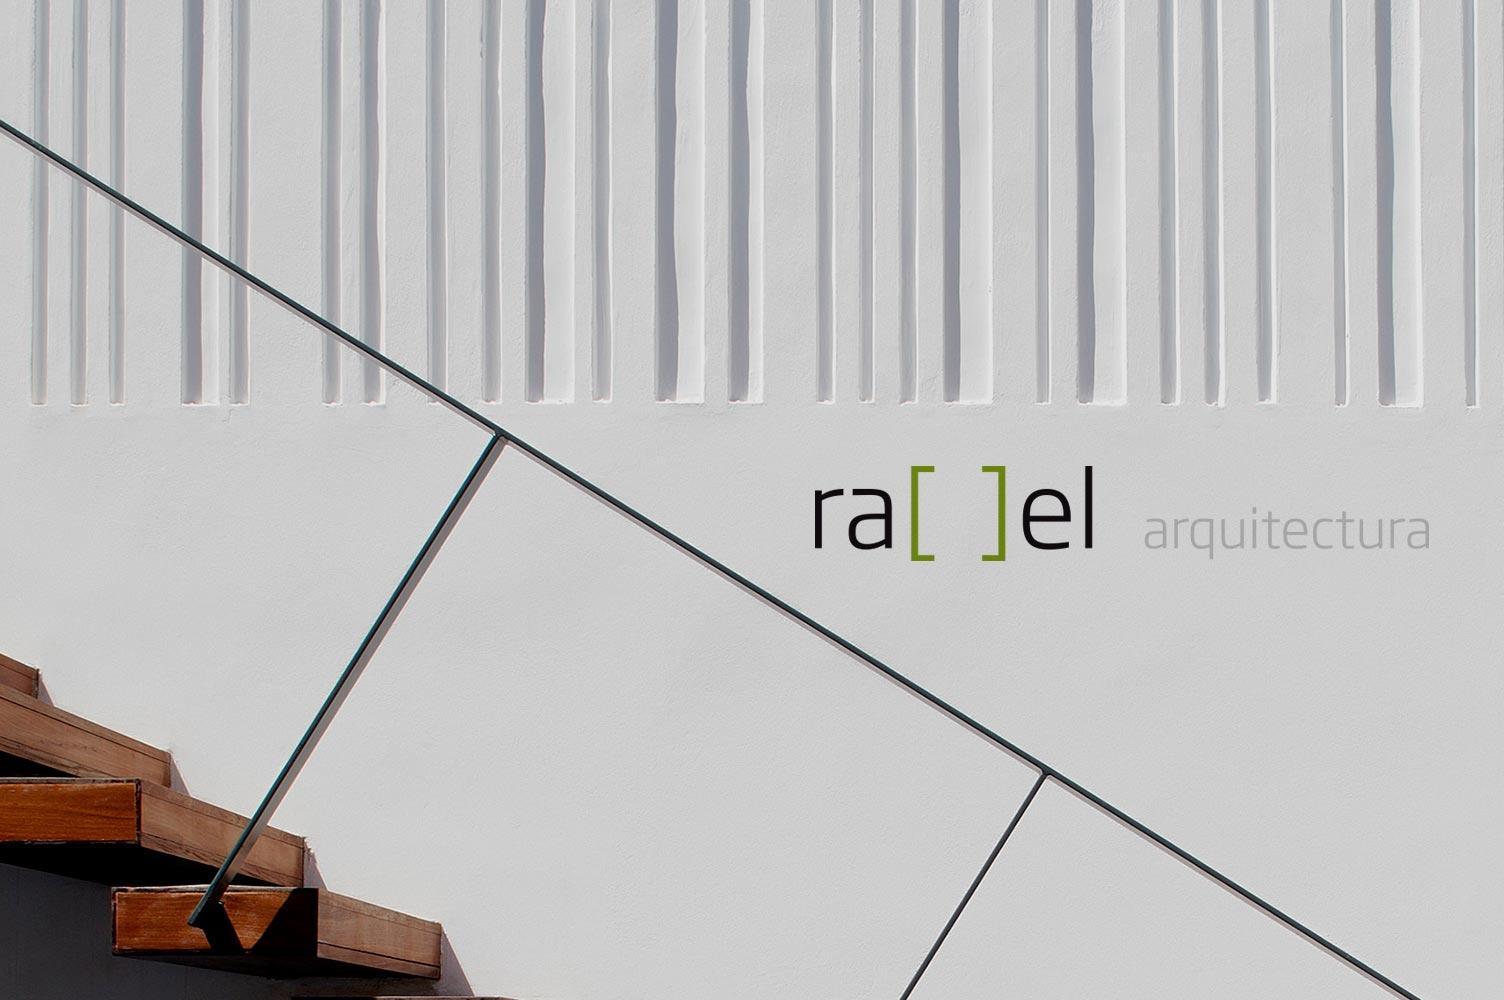 Imagen de marca página web dinámica rael arquitectura